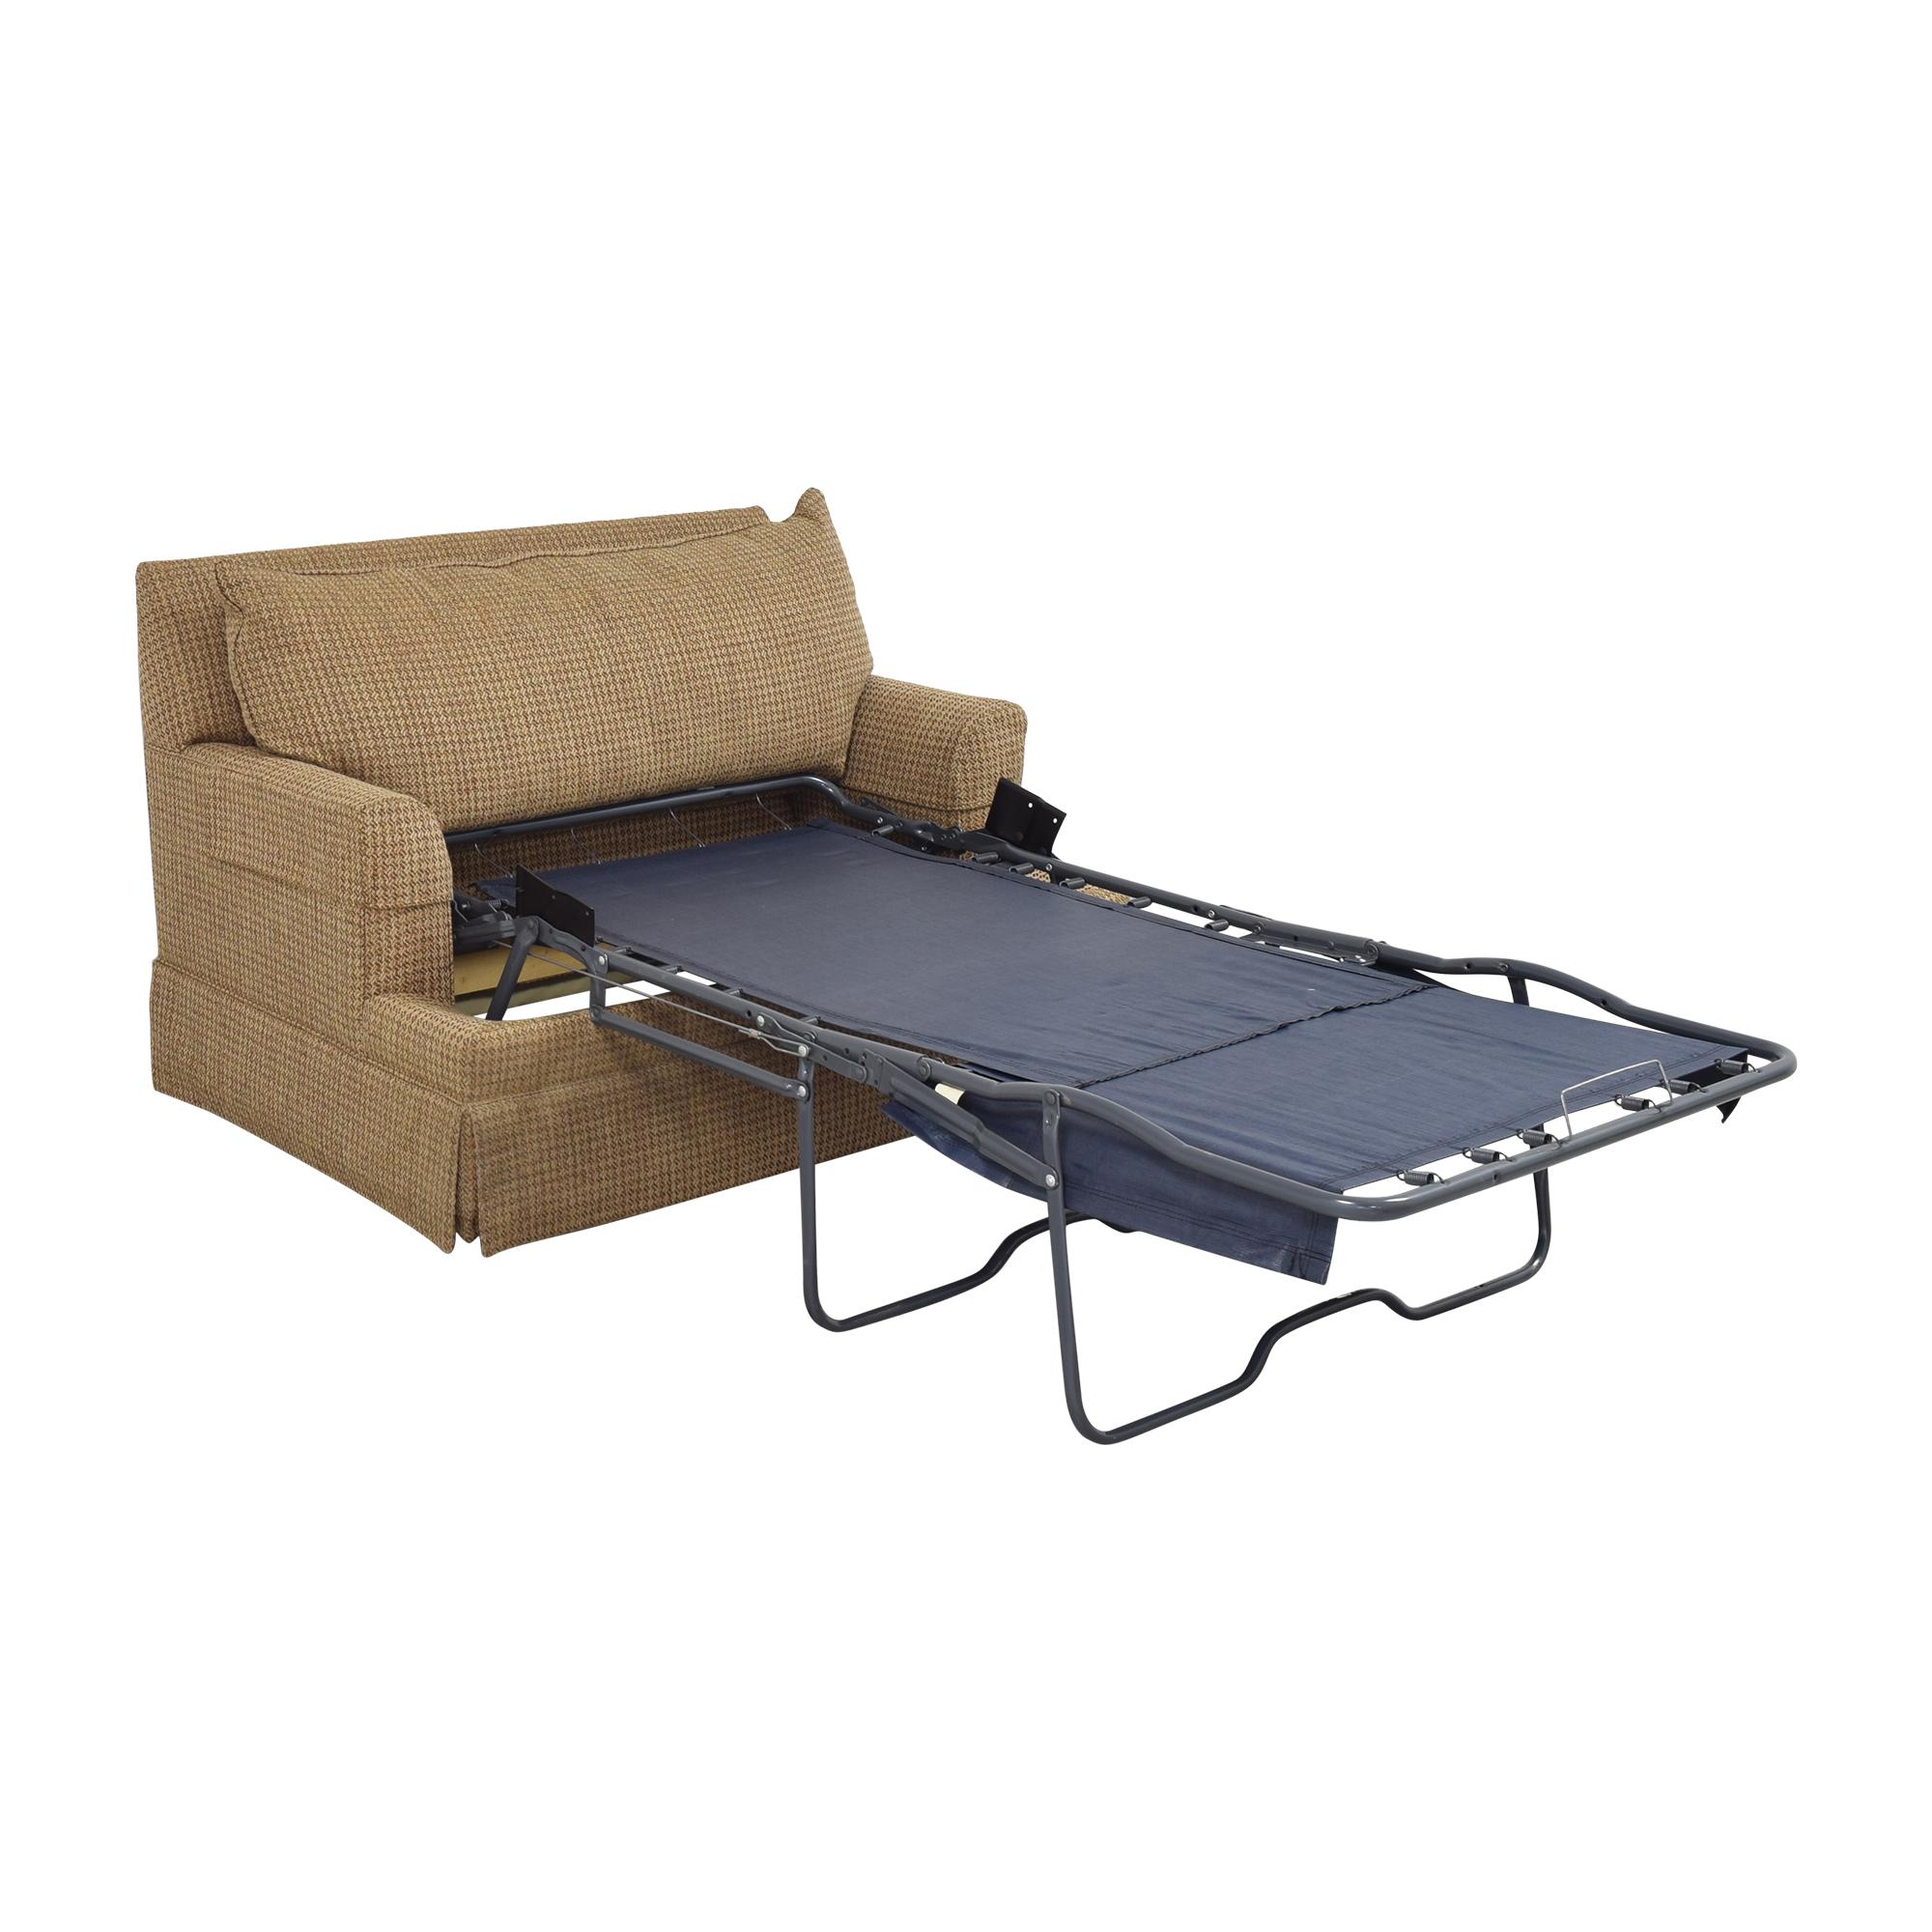 Ethan Allen Ethan Allen Chair and a Half Twin Sleeper Chairs